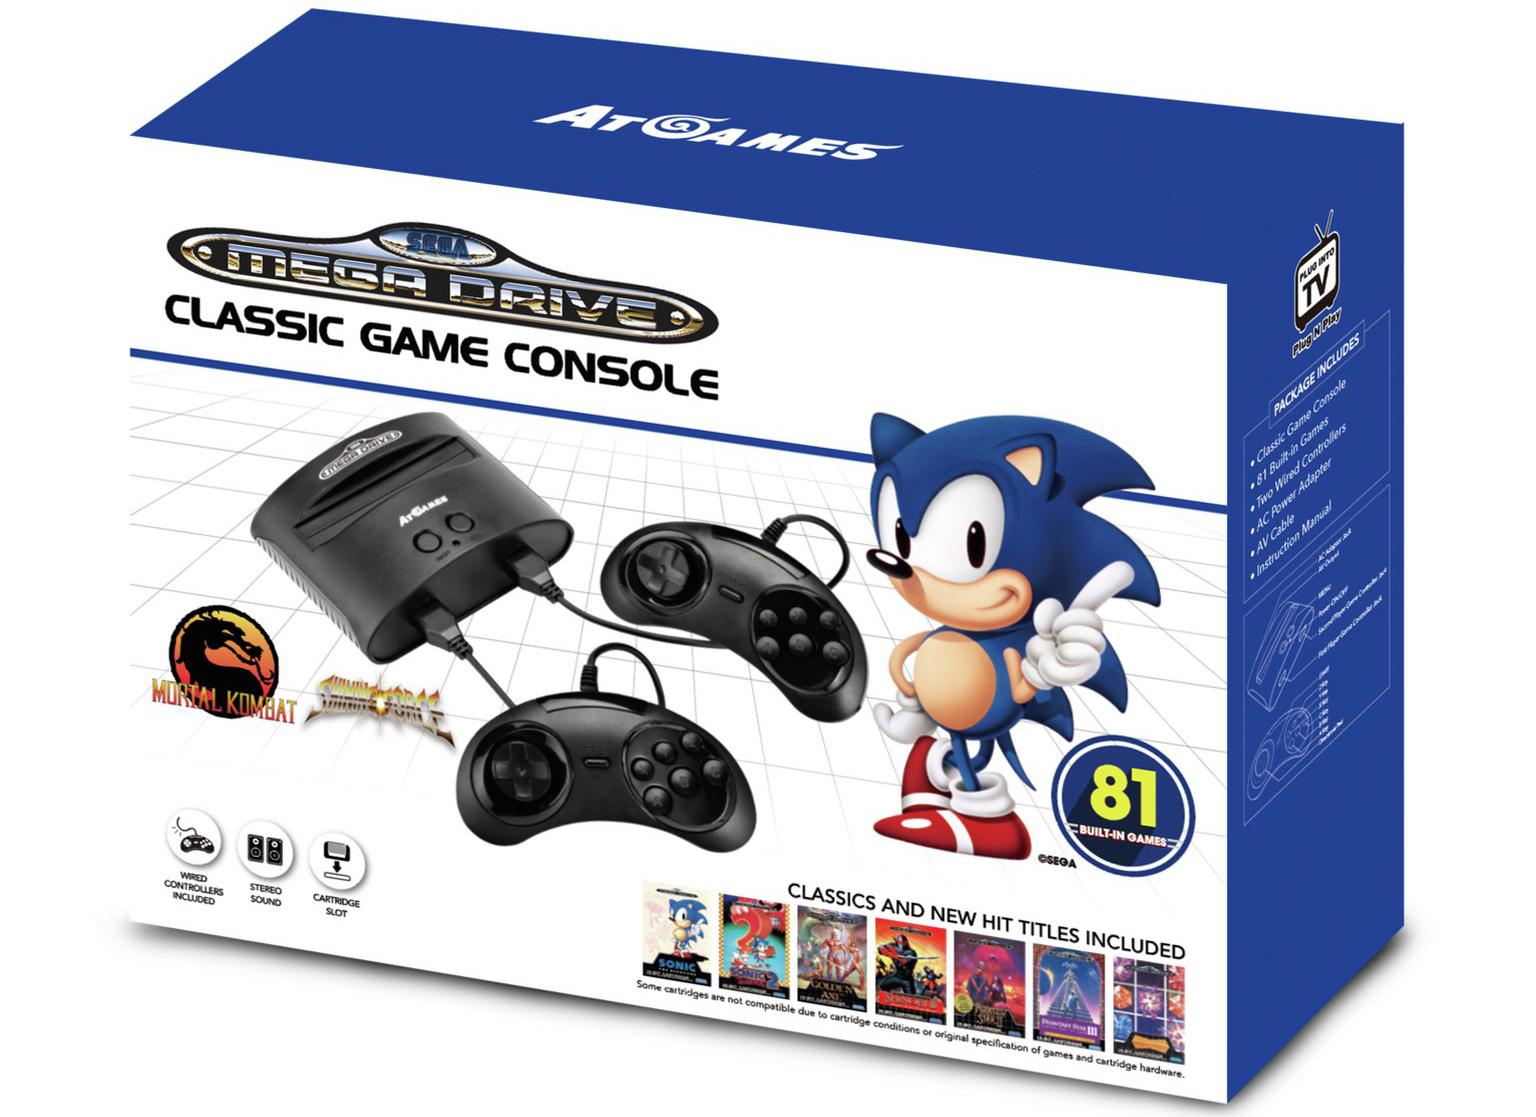 Sega Mega Drive Classic - in the box